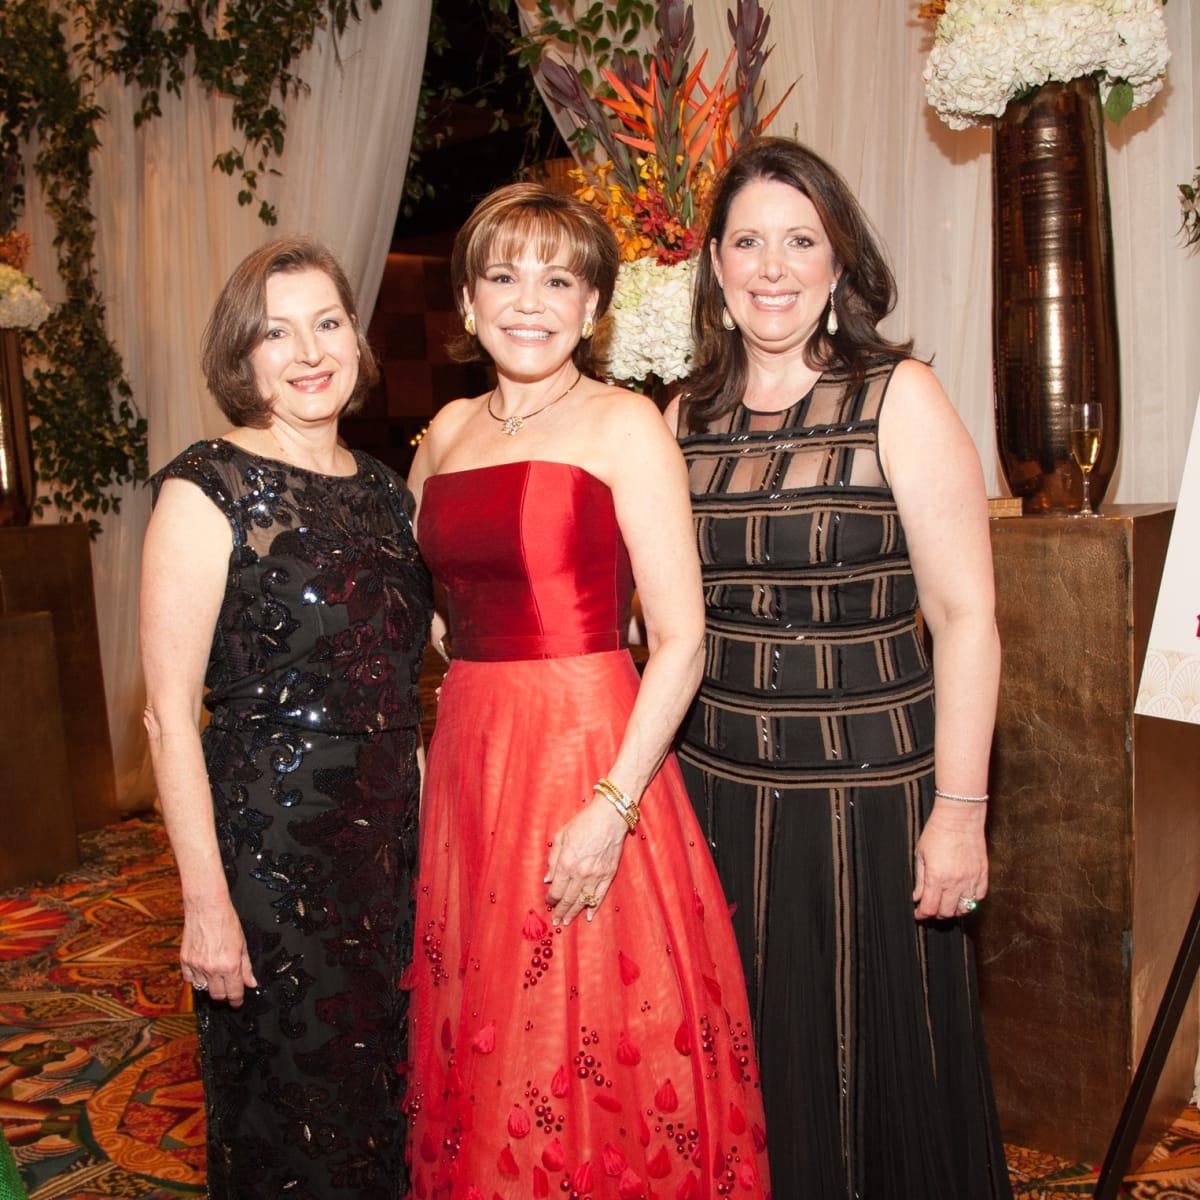 Heart Ball, Feb. 2016,  Marilynn Adame, Hallie Vanderhider, Julie Roberts